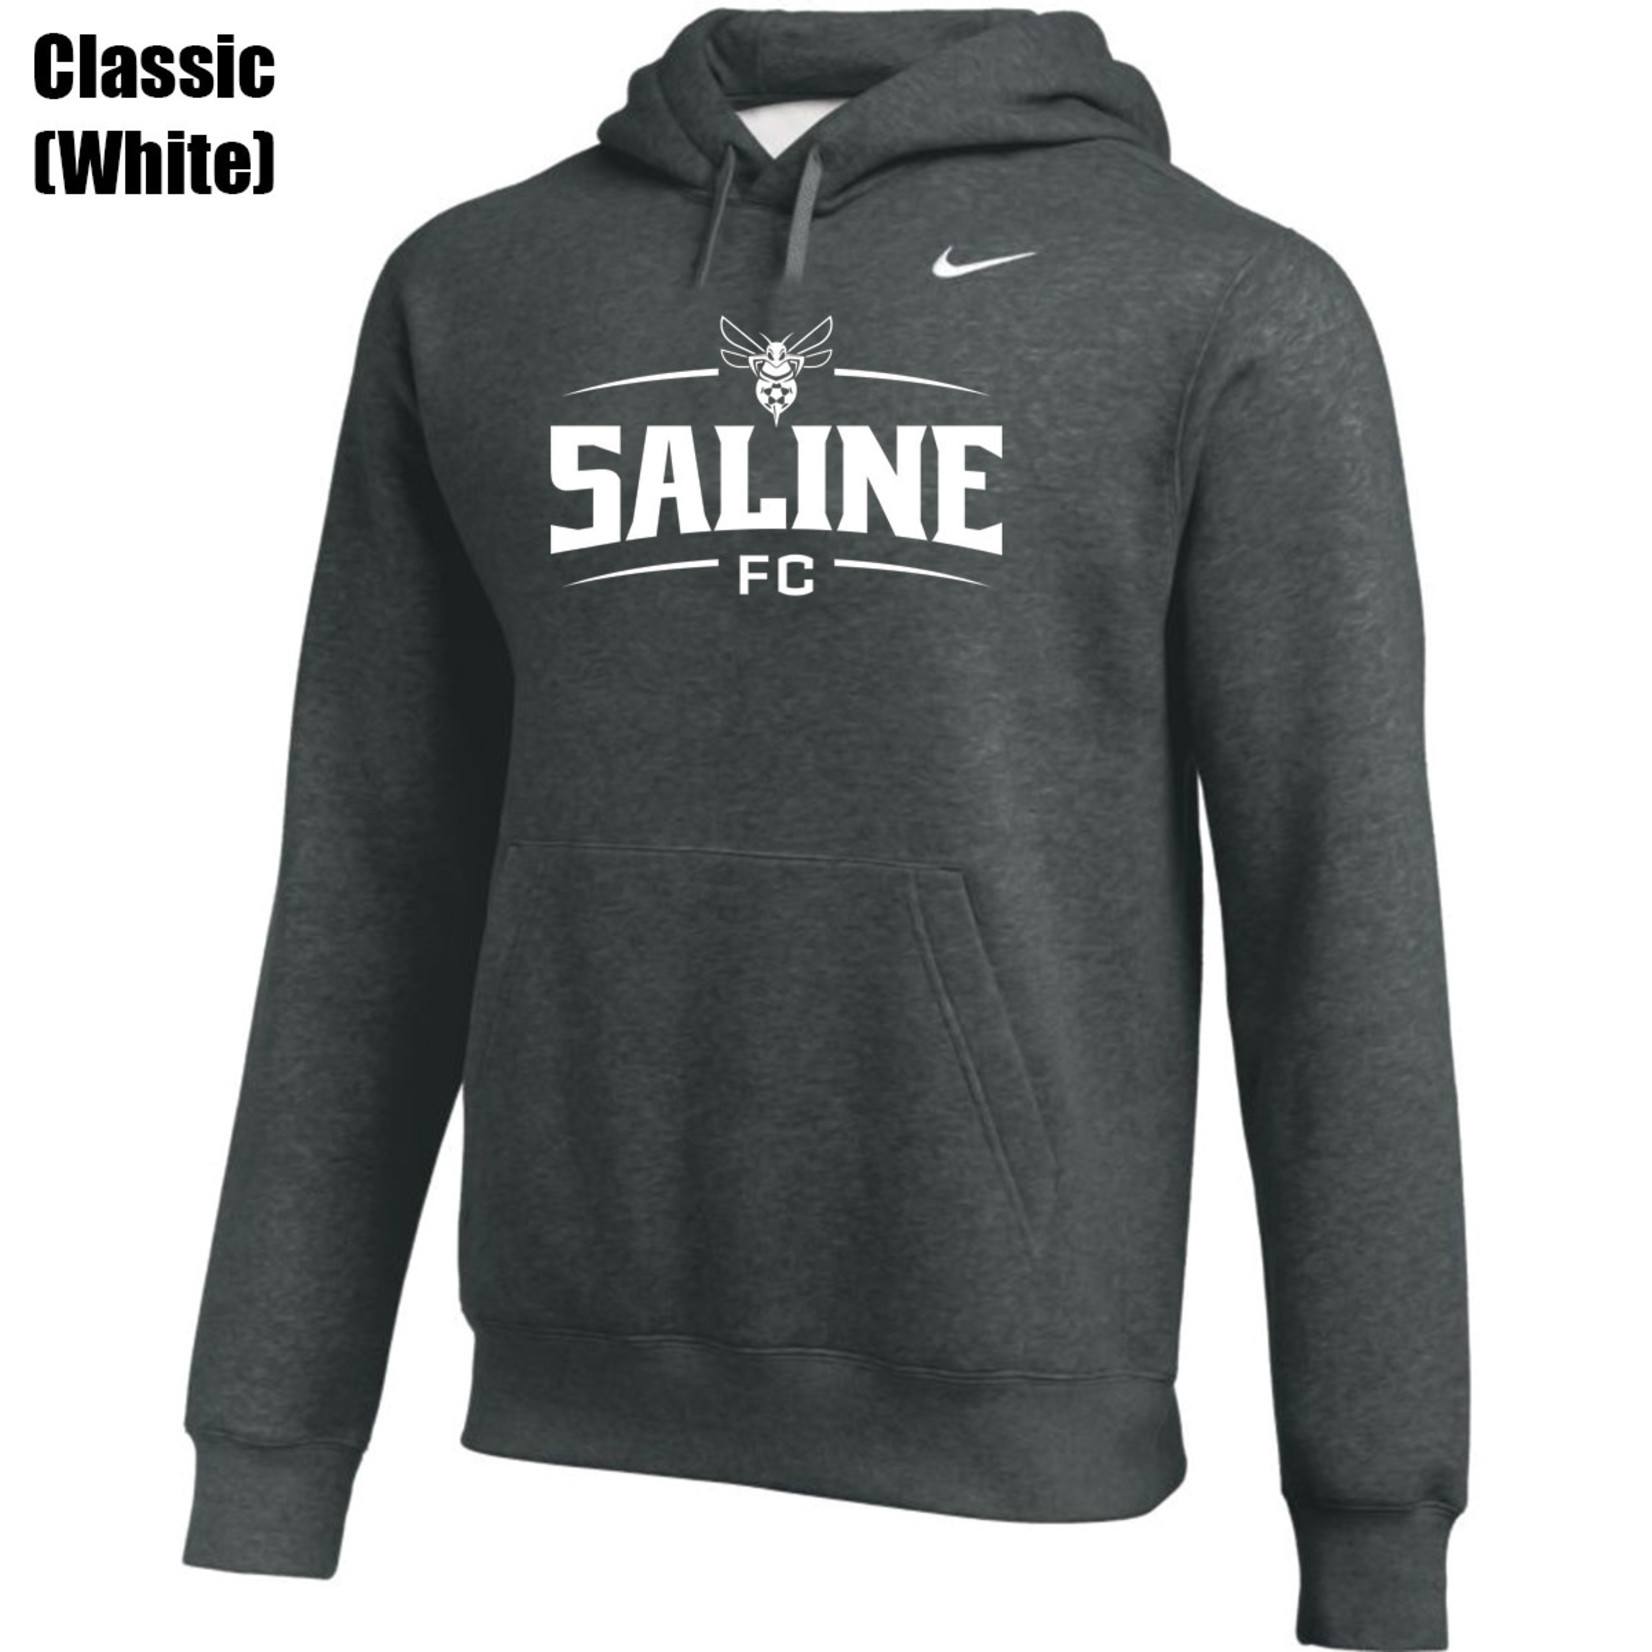 NIKE SALINE CLUB HOODY (DARK GRAY)